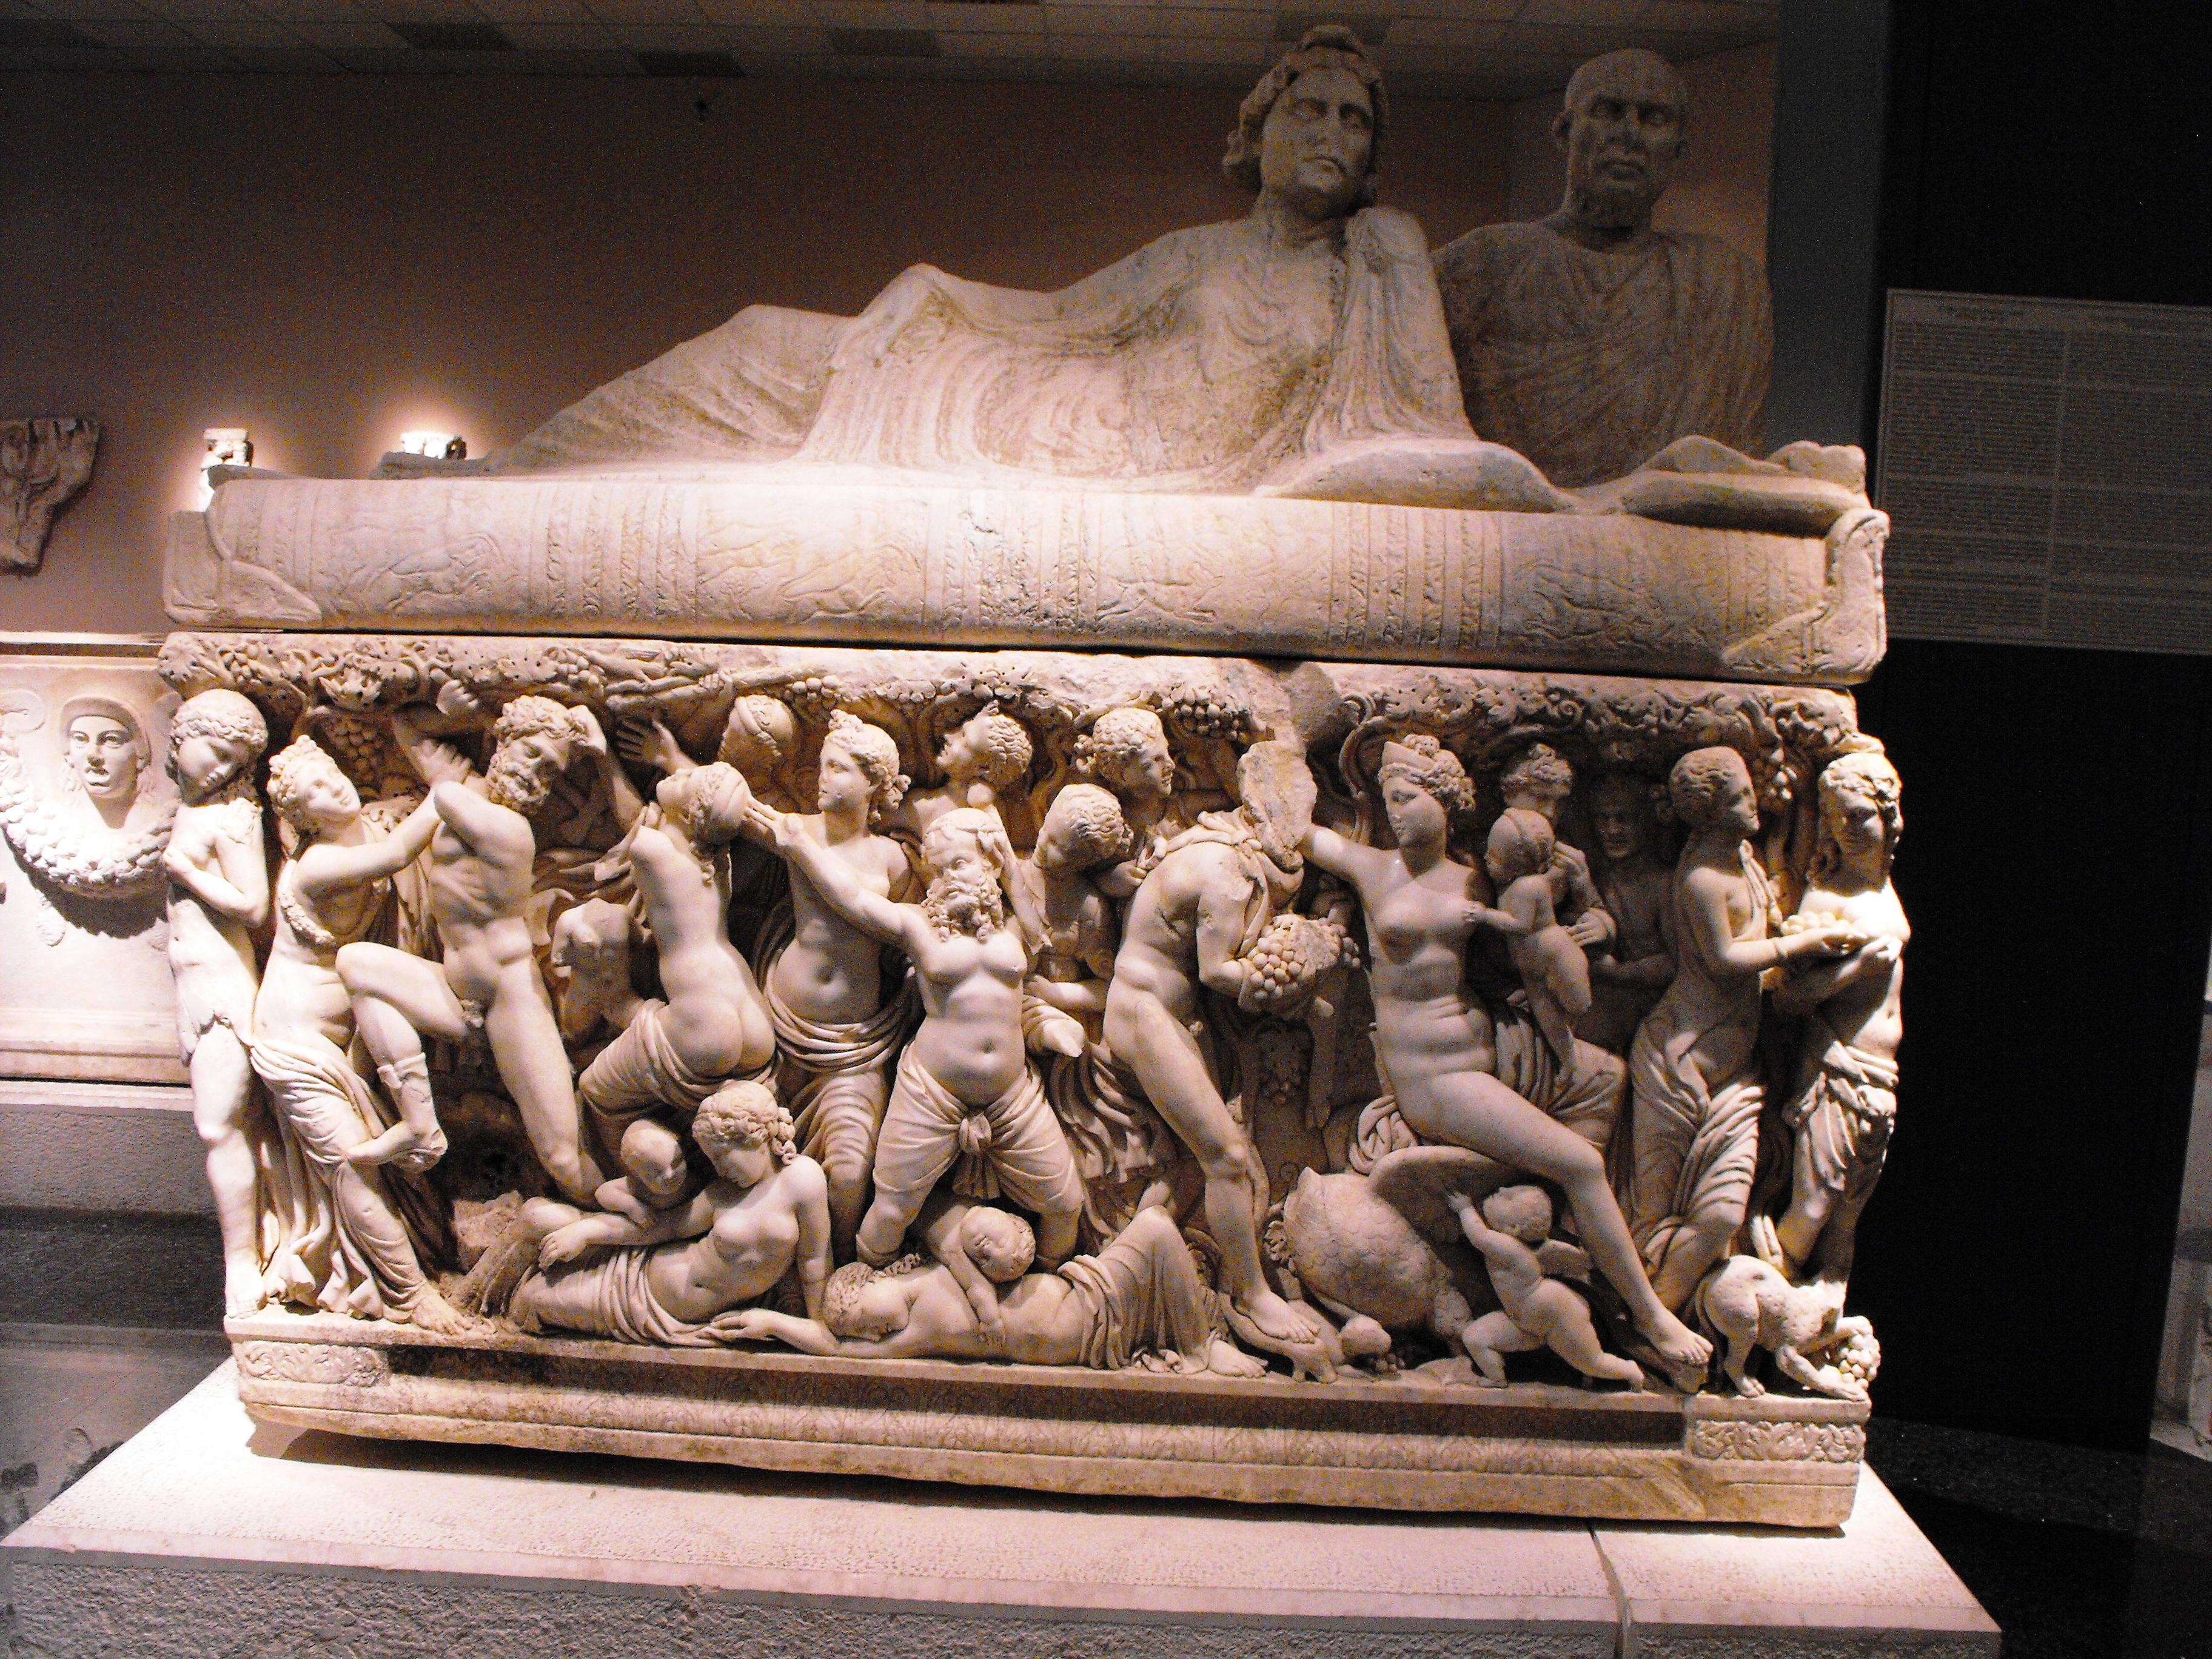 Antique sarkofag, Antalya, Antique, Archaeological, Exhibit, HQ Photo